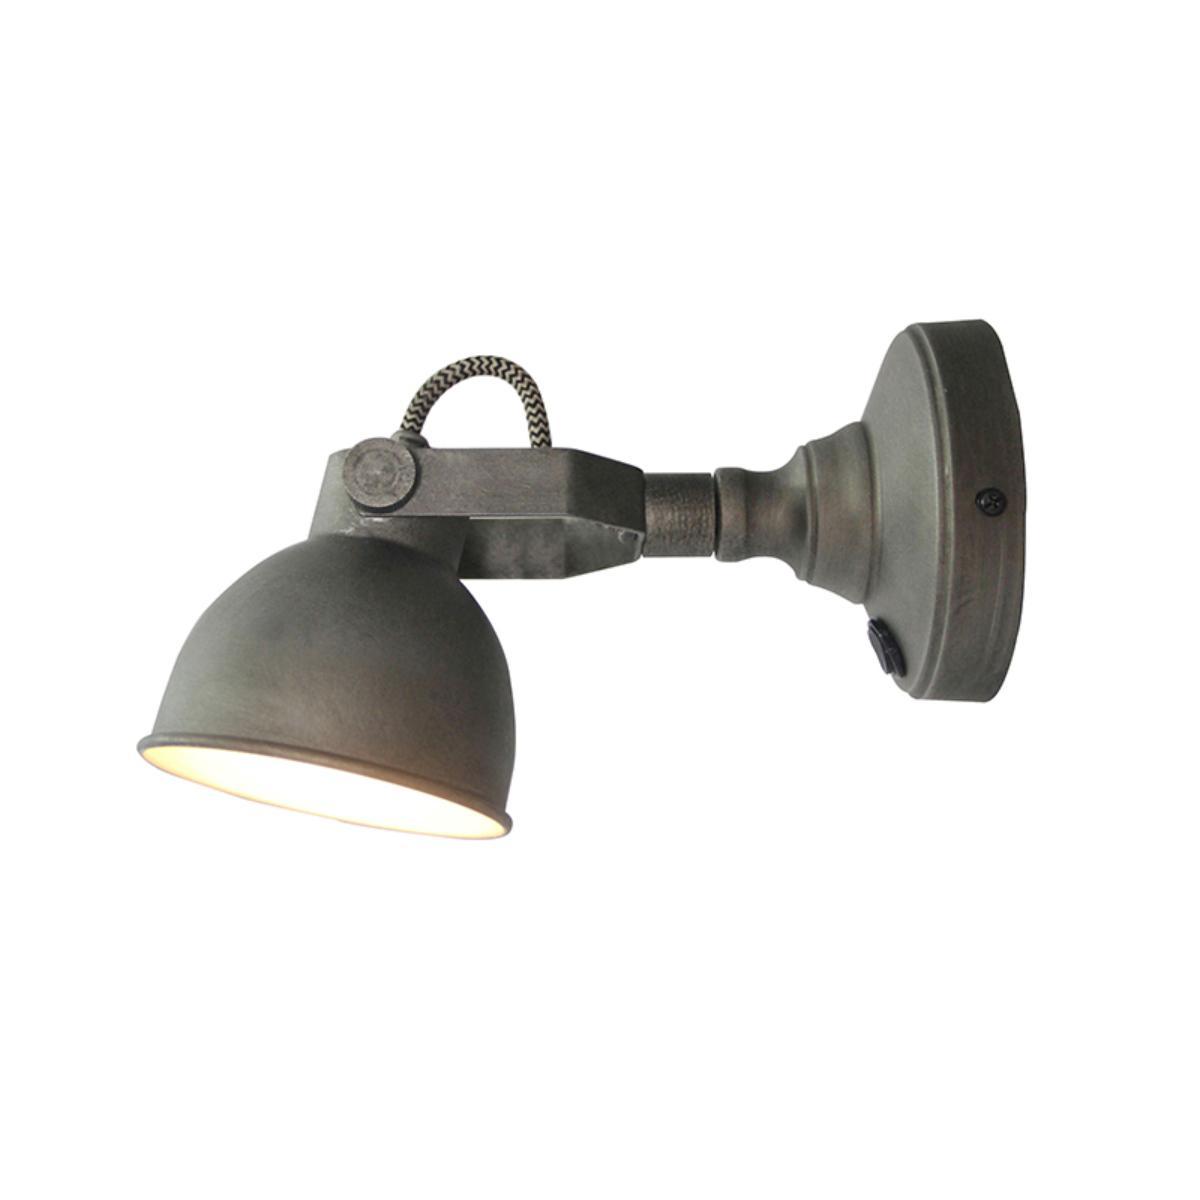 Wandlamp Bow - Grijs - Metaal - M